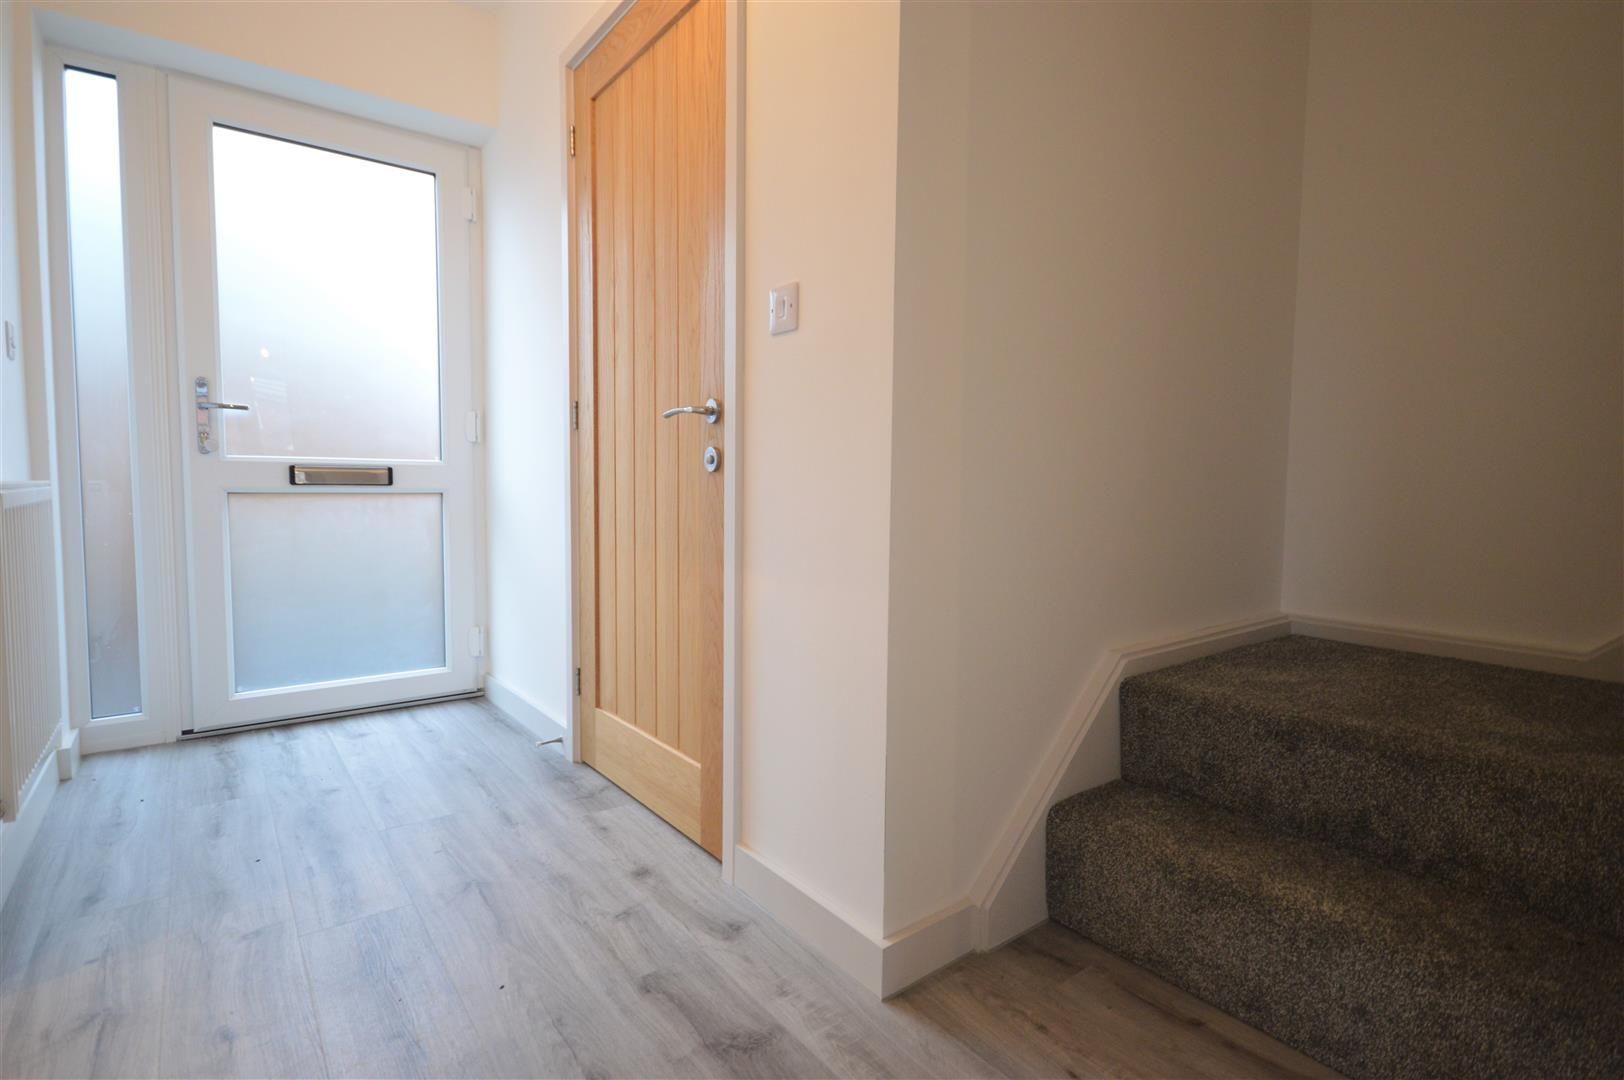 2 bed detached for sale in Leominster  - Property Image 6